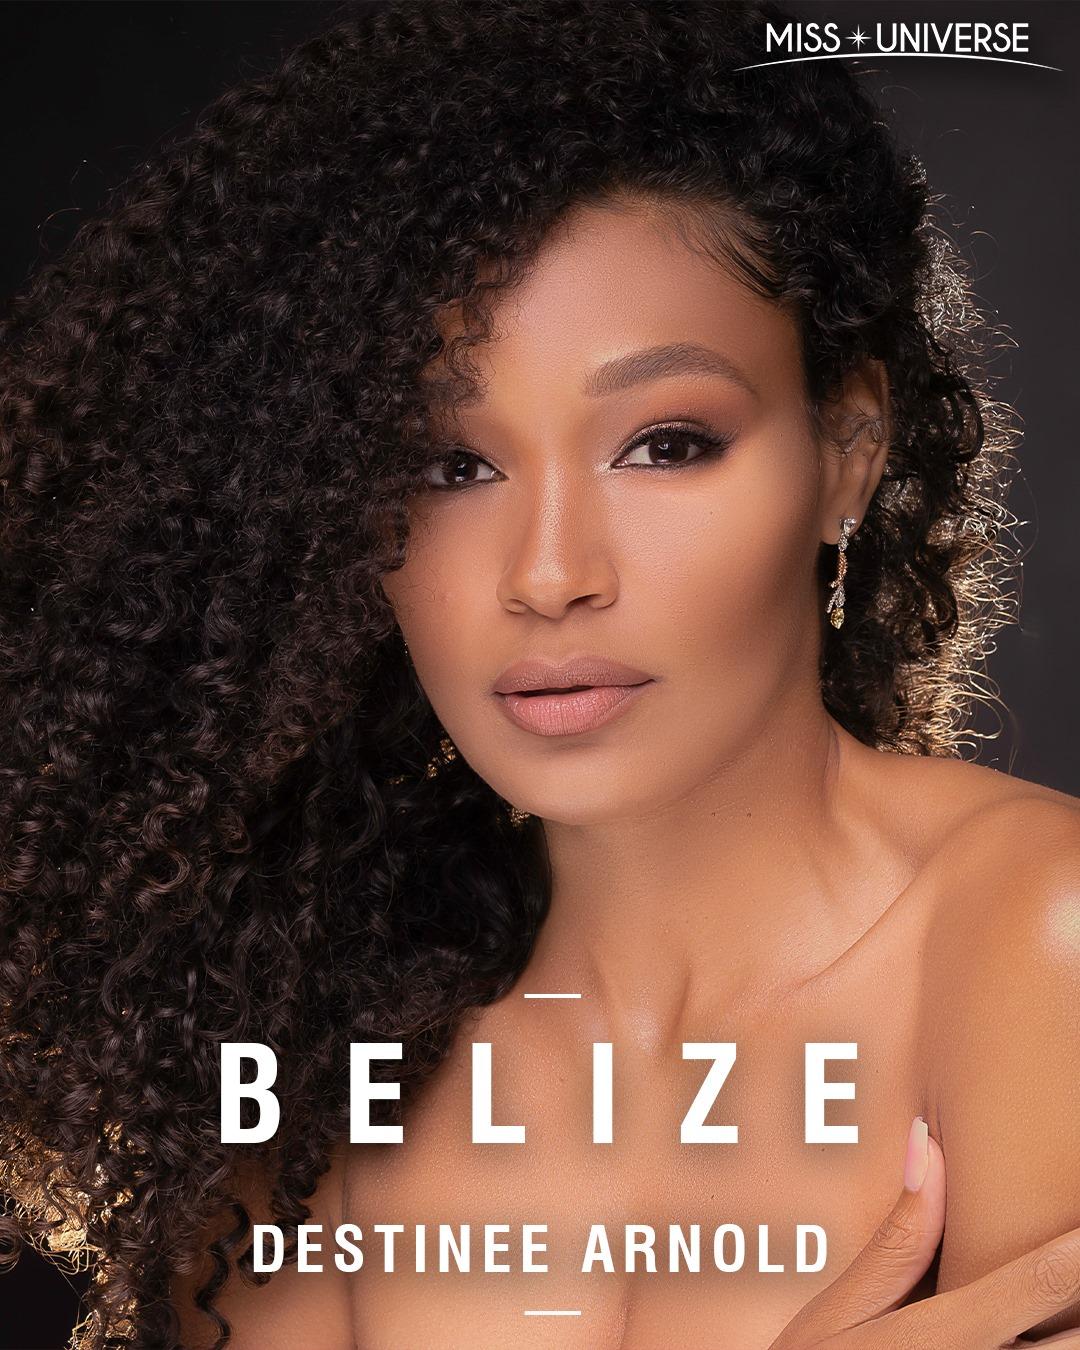 Destinee Dominique Arnold (BELIZE INTERNATIONAL 2012 & UNIVERSE 2019) 5